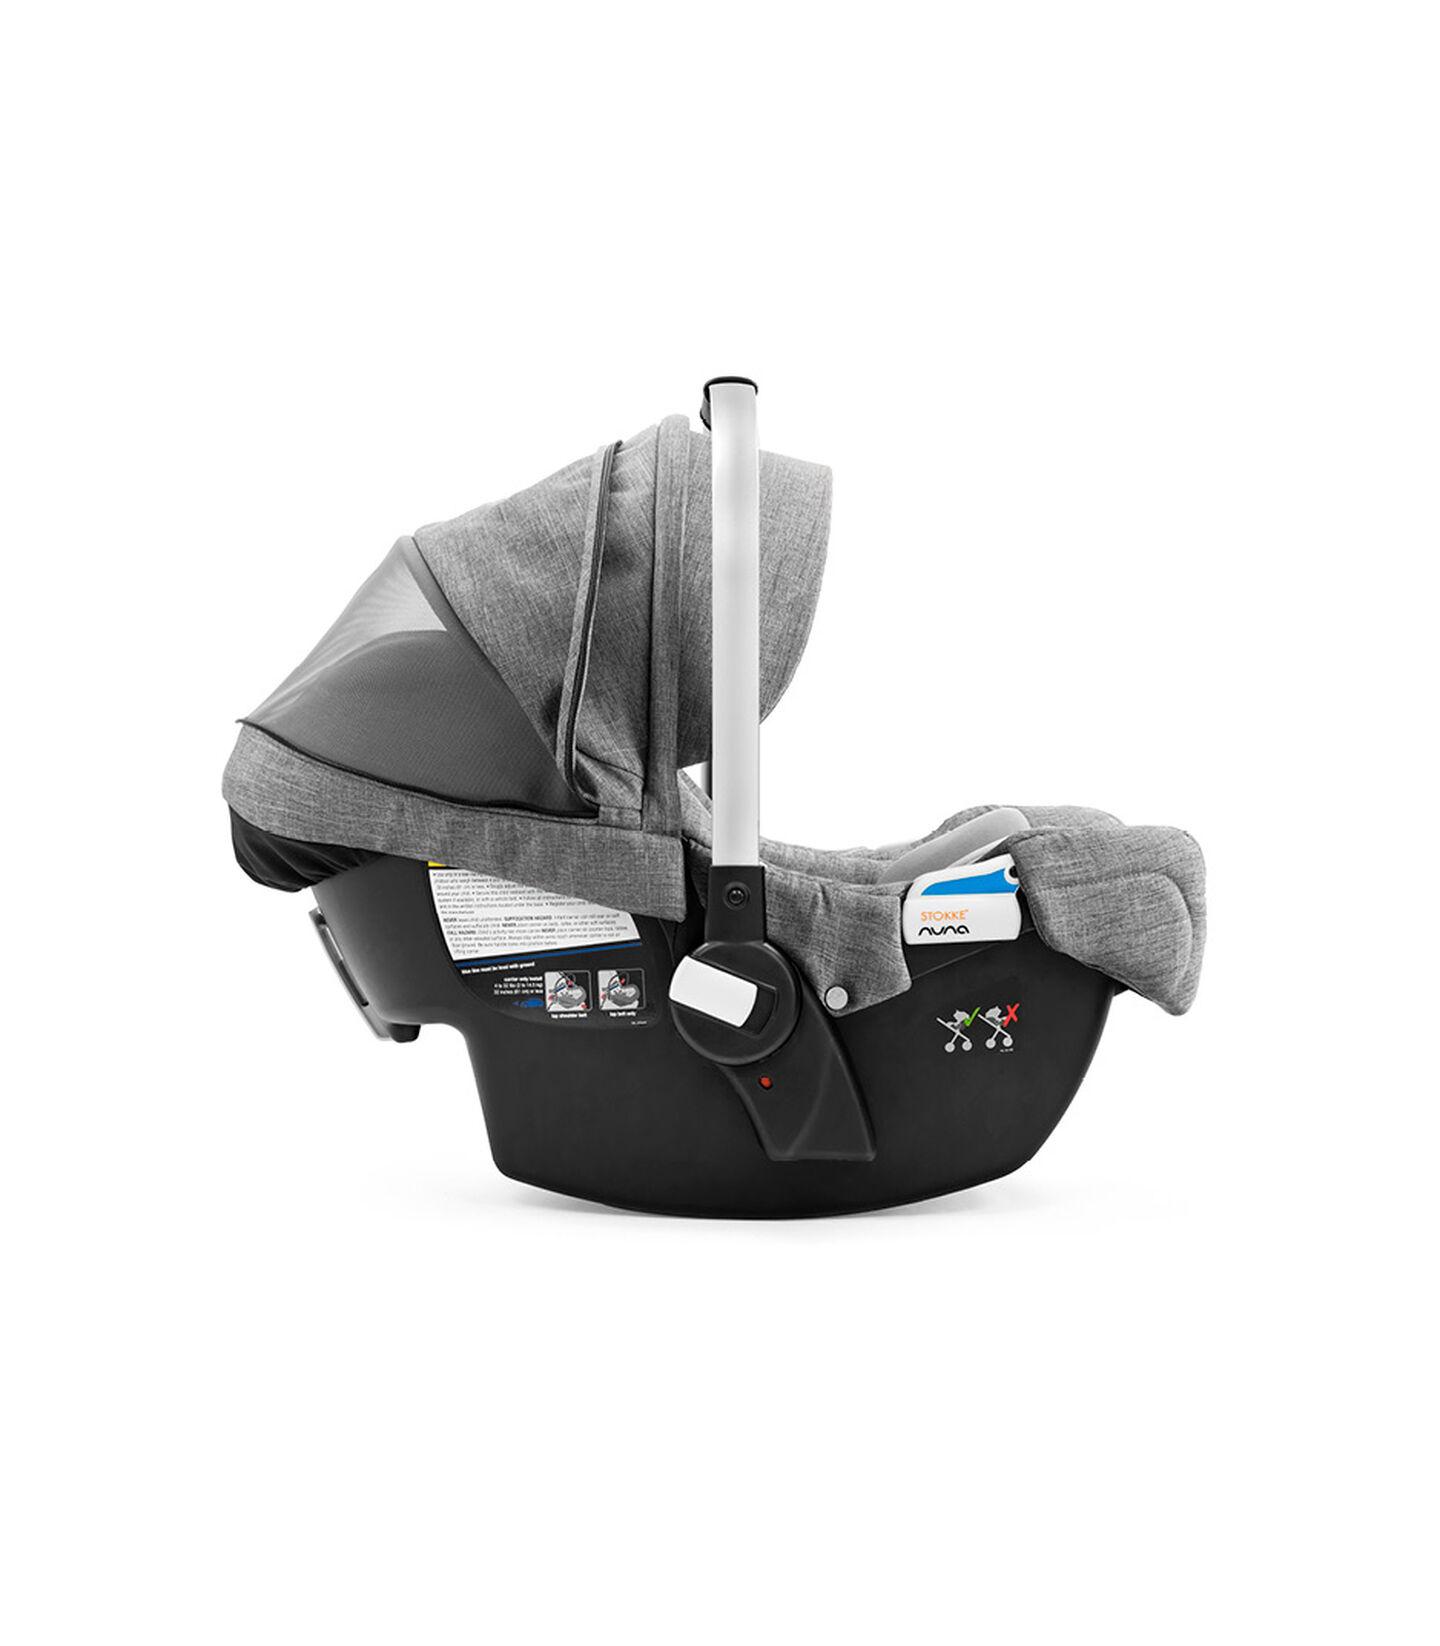 Stokke® PIPA™ by Nuna® Black Car Seat Black Melange, Black Melange, mainview view 2